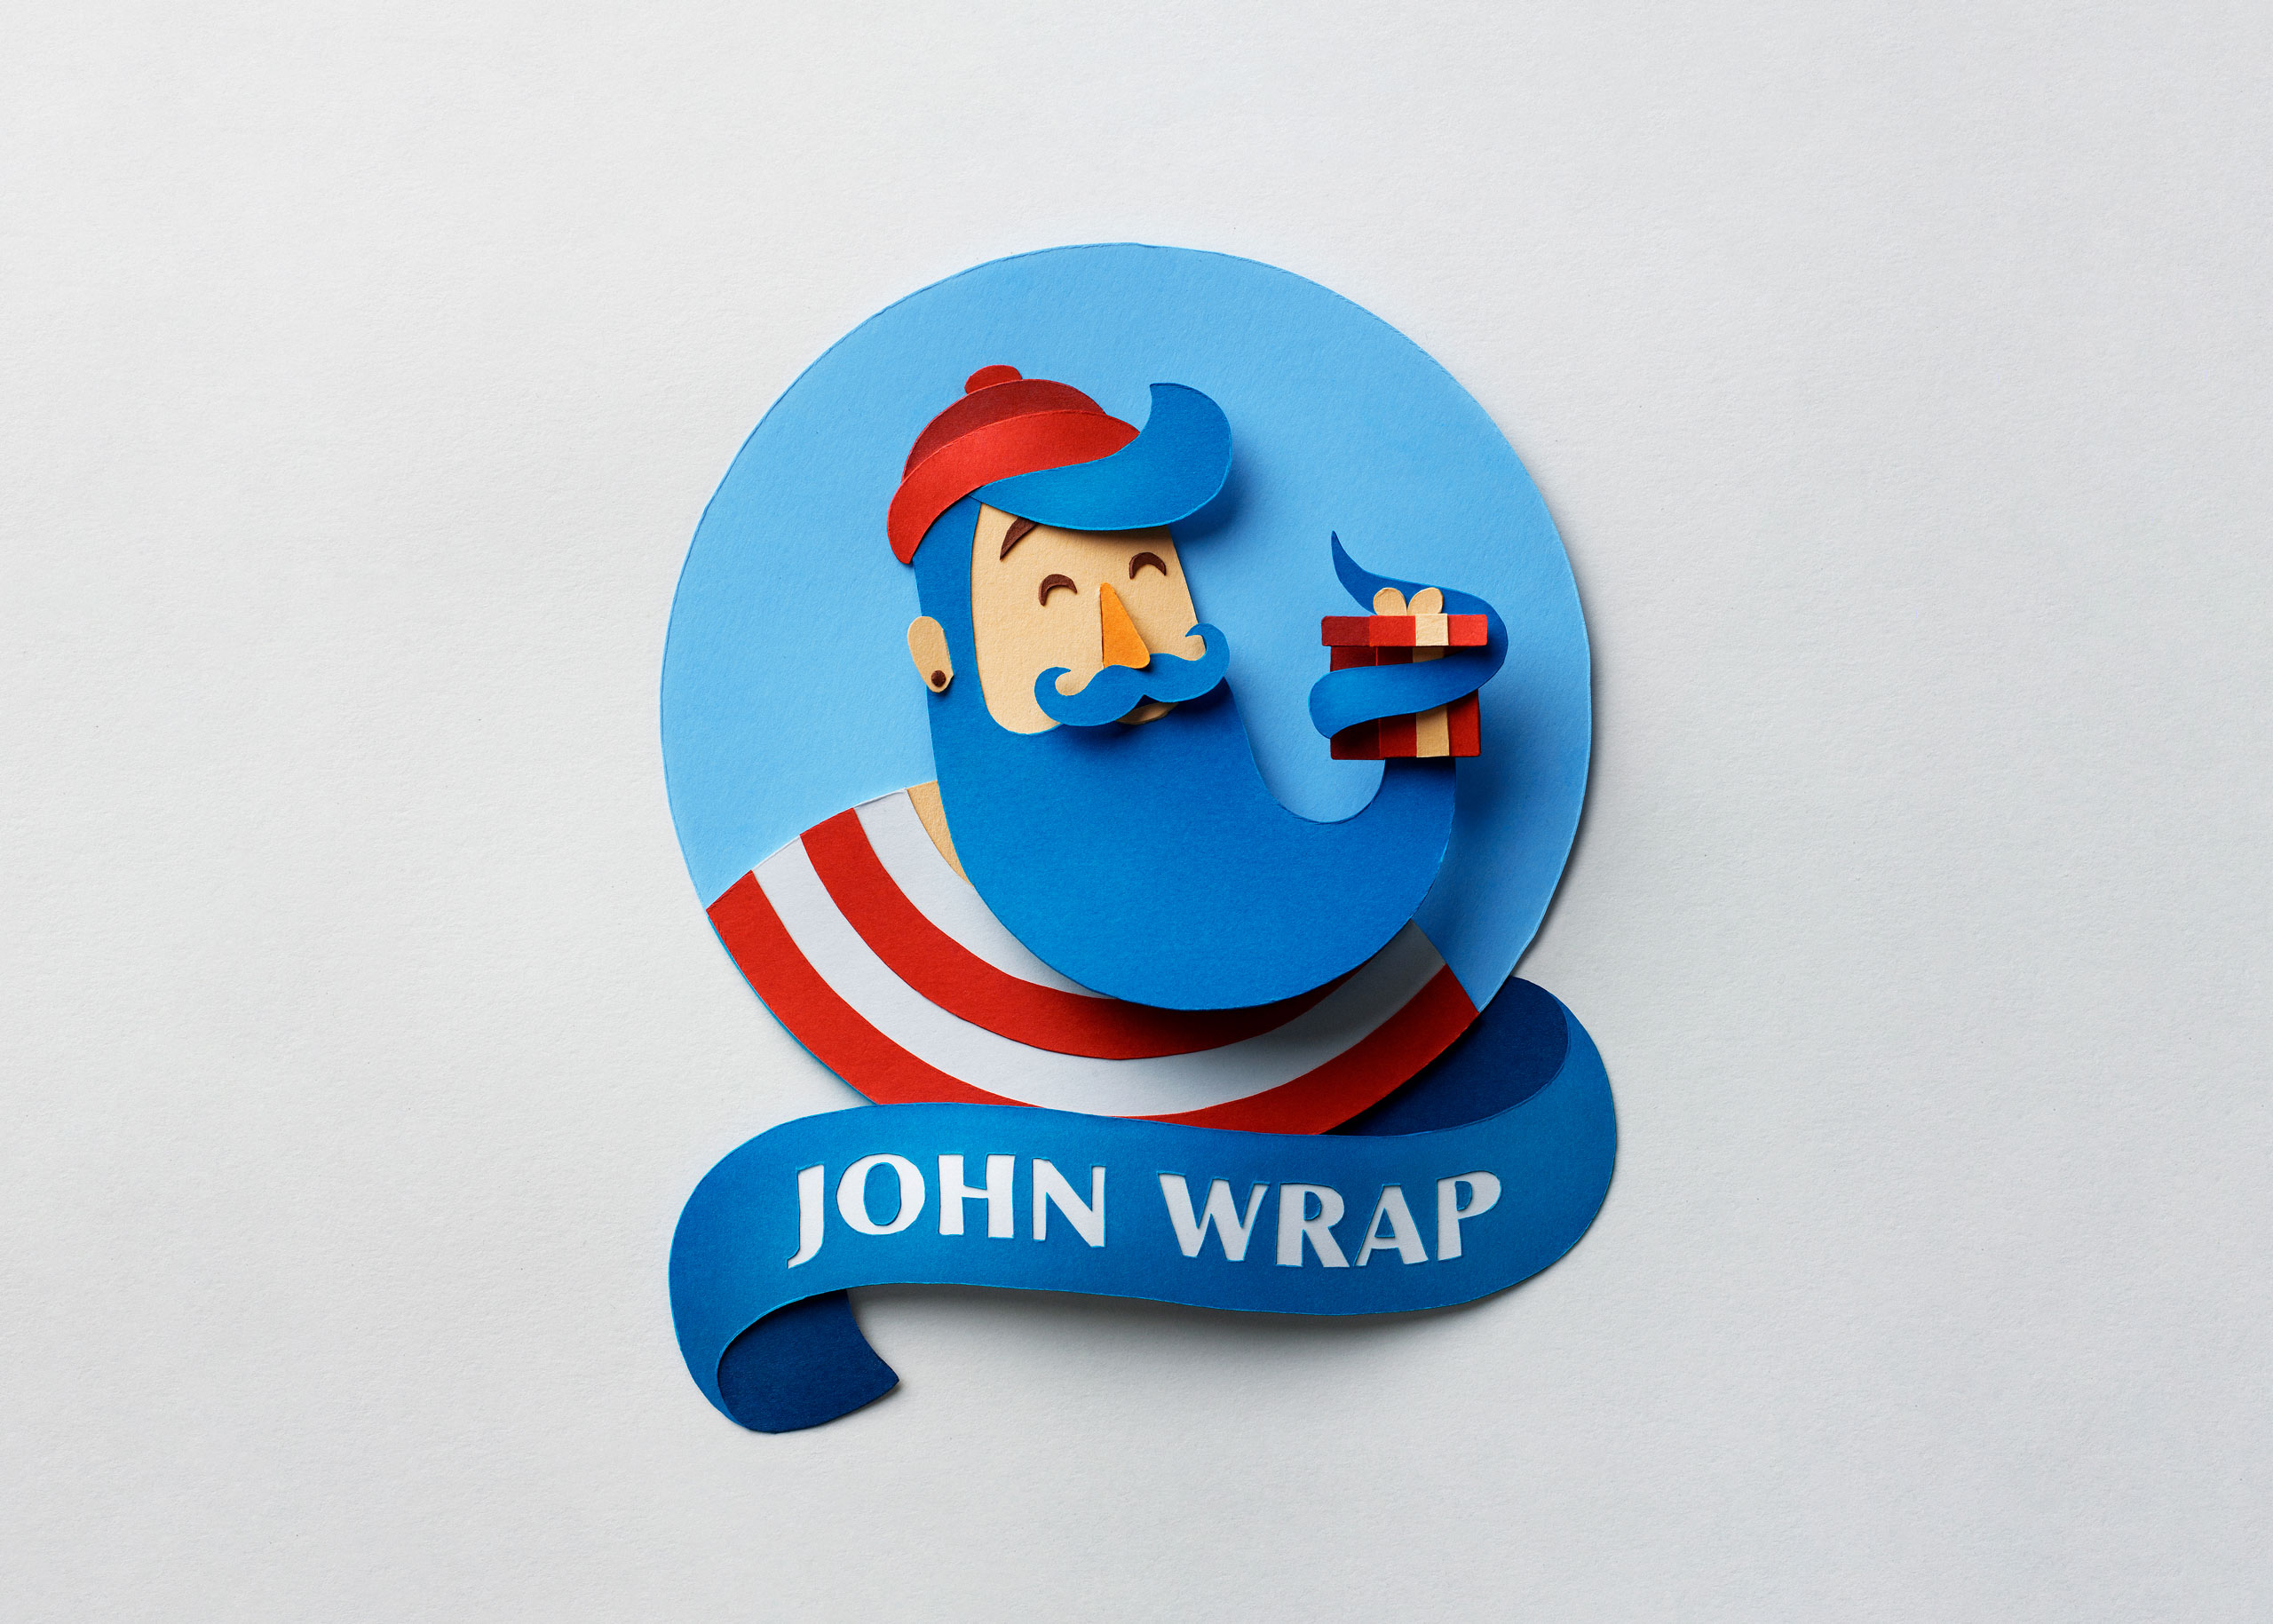 JW_Logo_Paper_White_BG_w2560_quality60